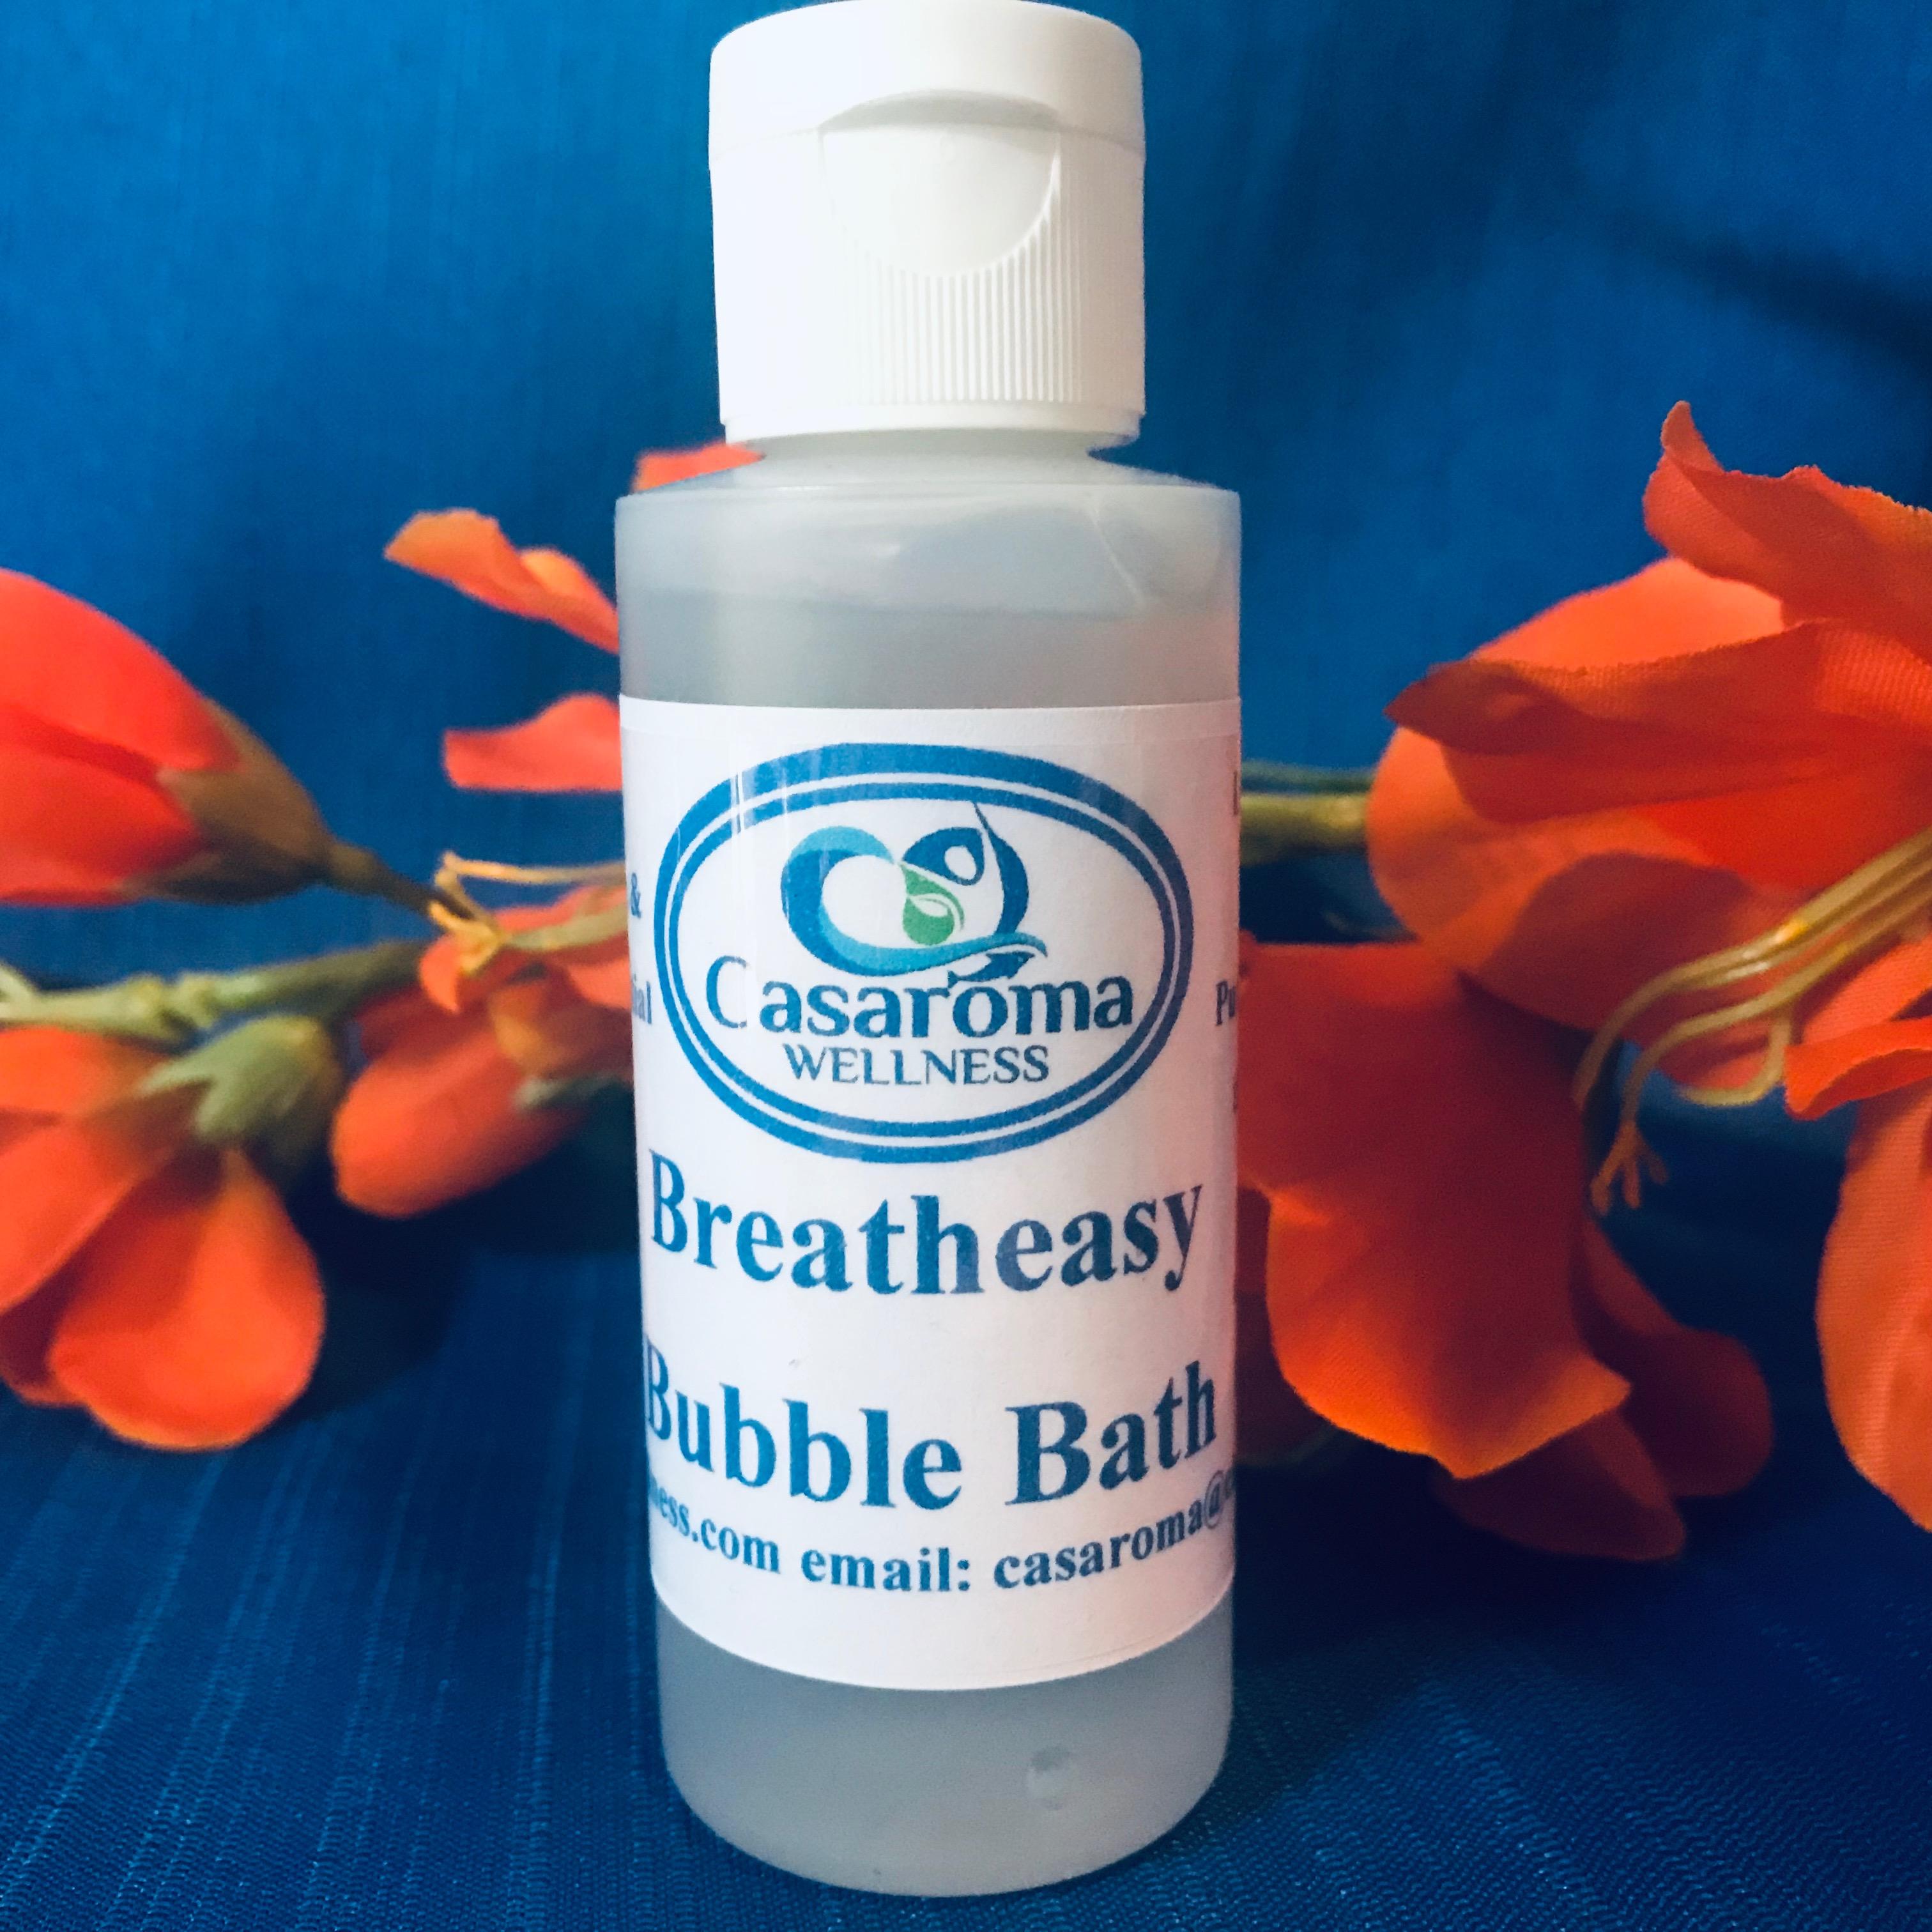 Breatheasy Bubble Bath